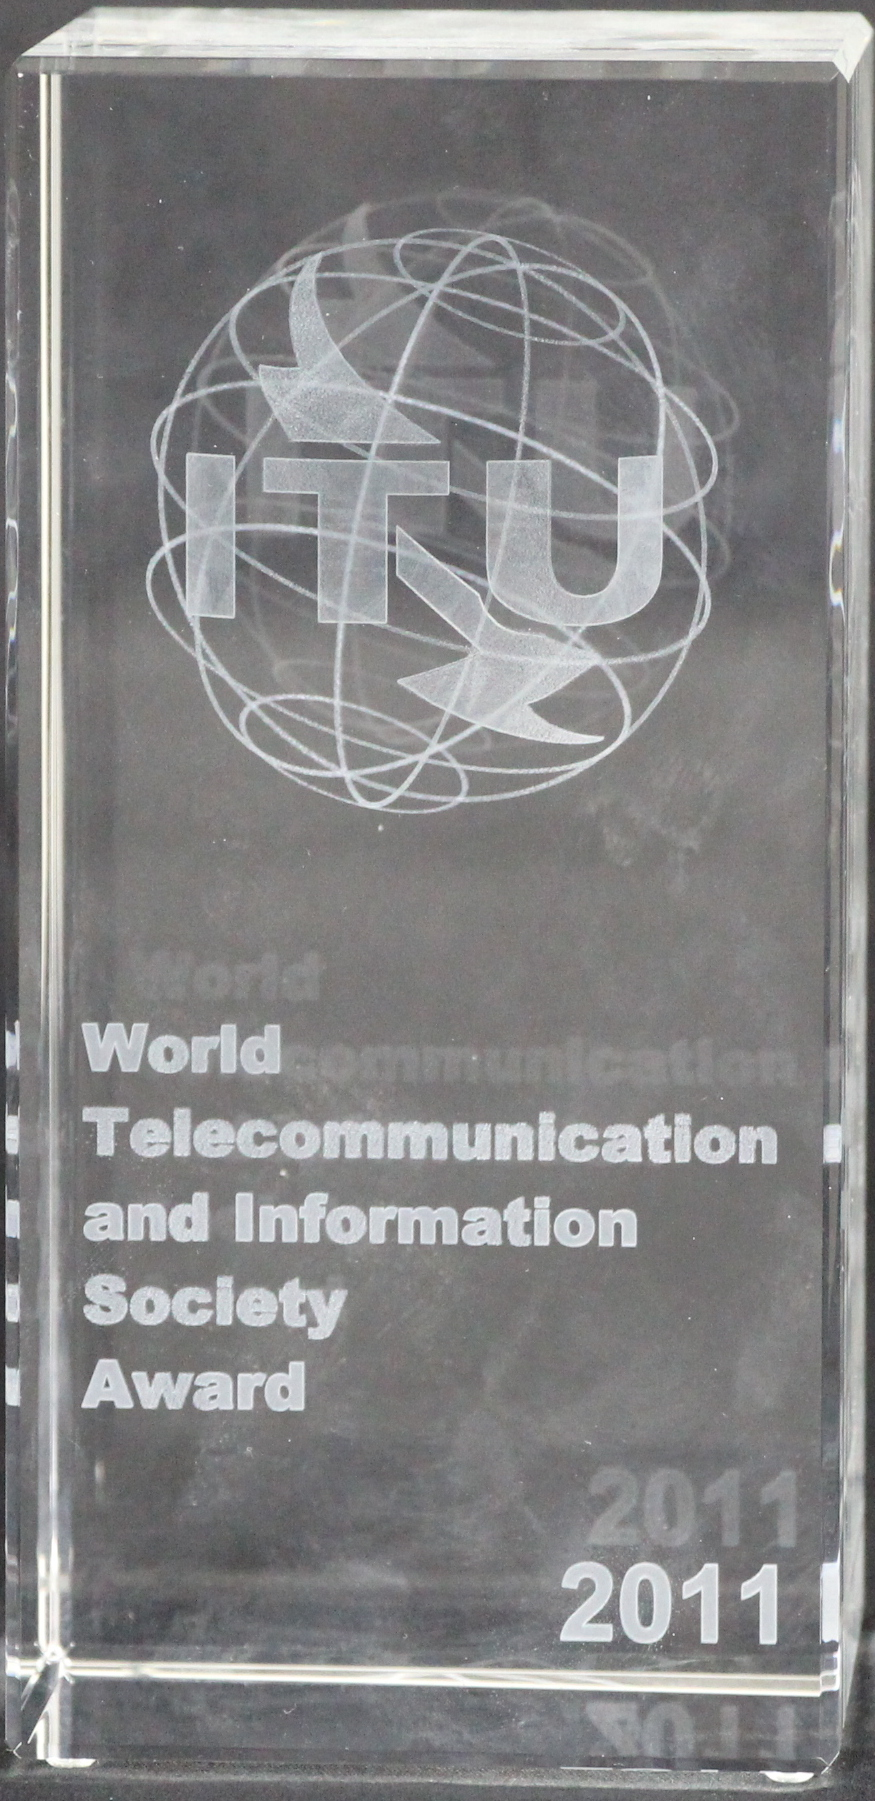 World Telecommunication and Information Society Award, ITU, 2011